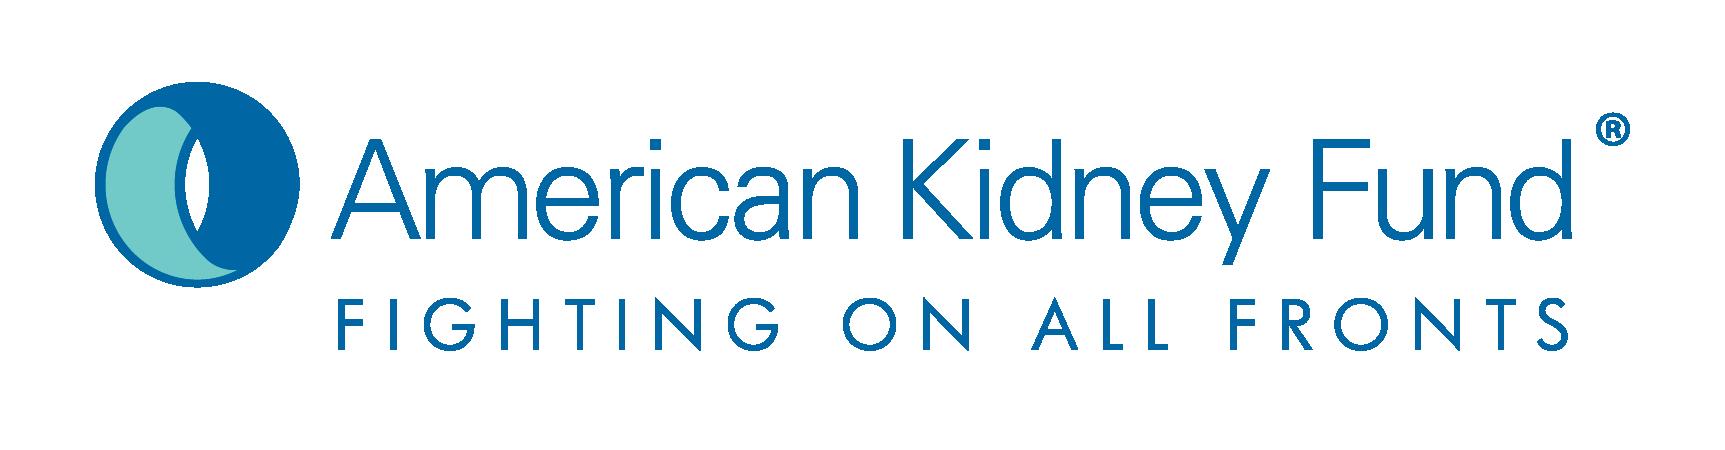 Logo of charity American Kidney Fund